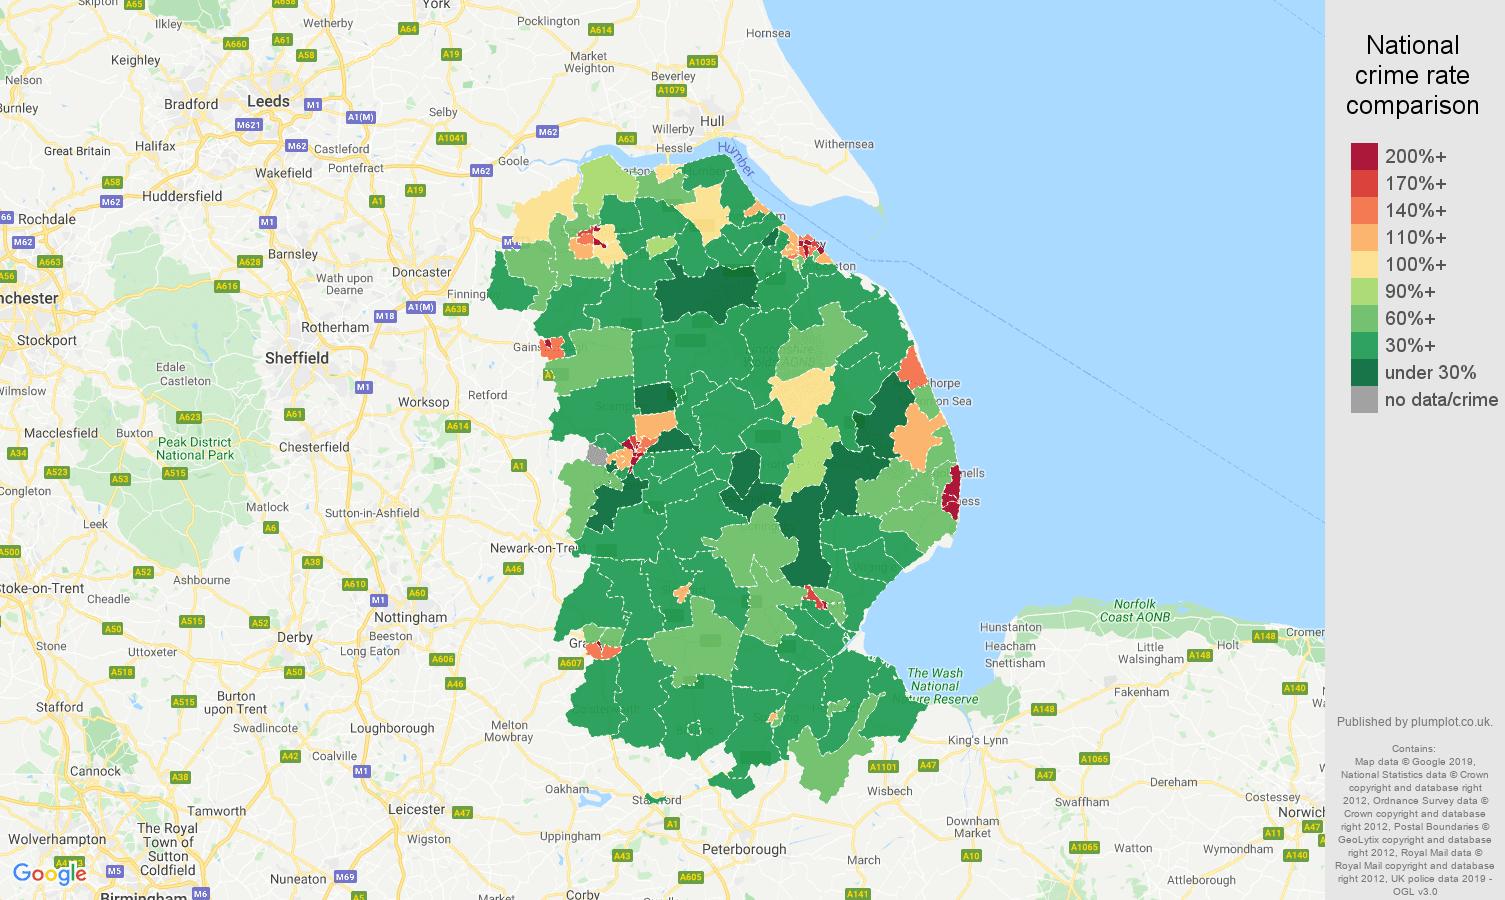 Lincolnshire public order crime rate comparison map